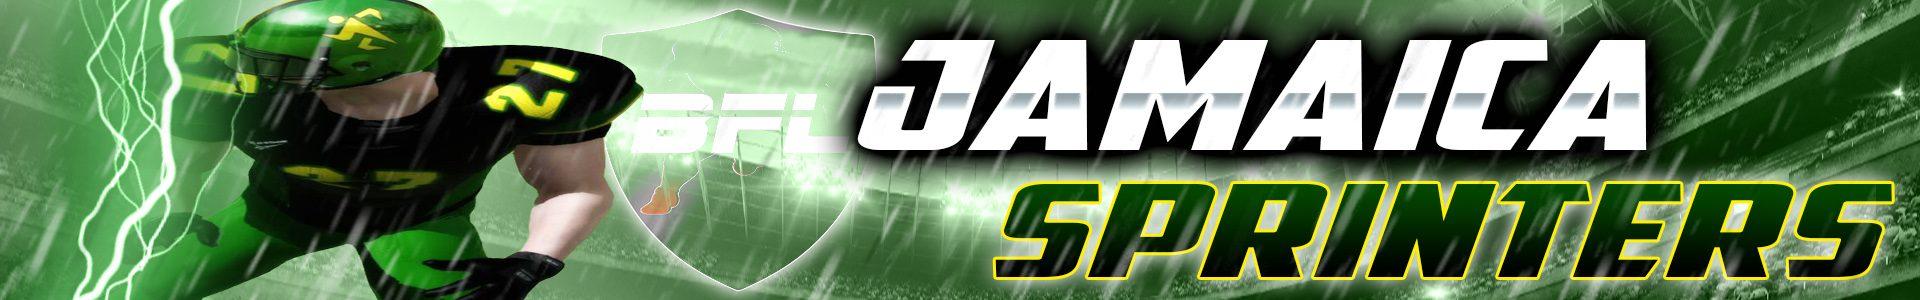 Jamaica Sprinters_Backbreaker BFL Wallpaper